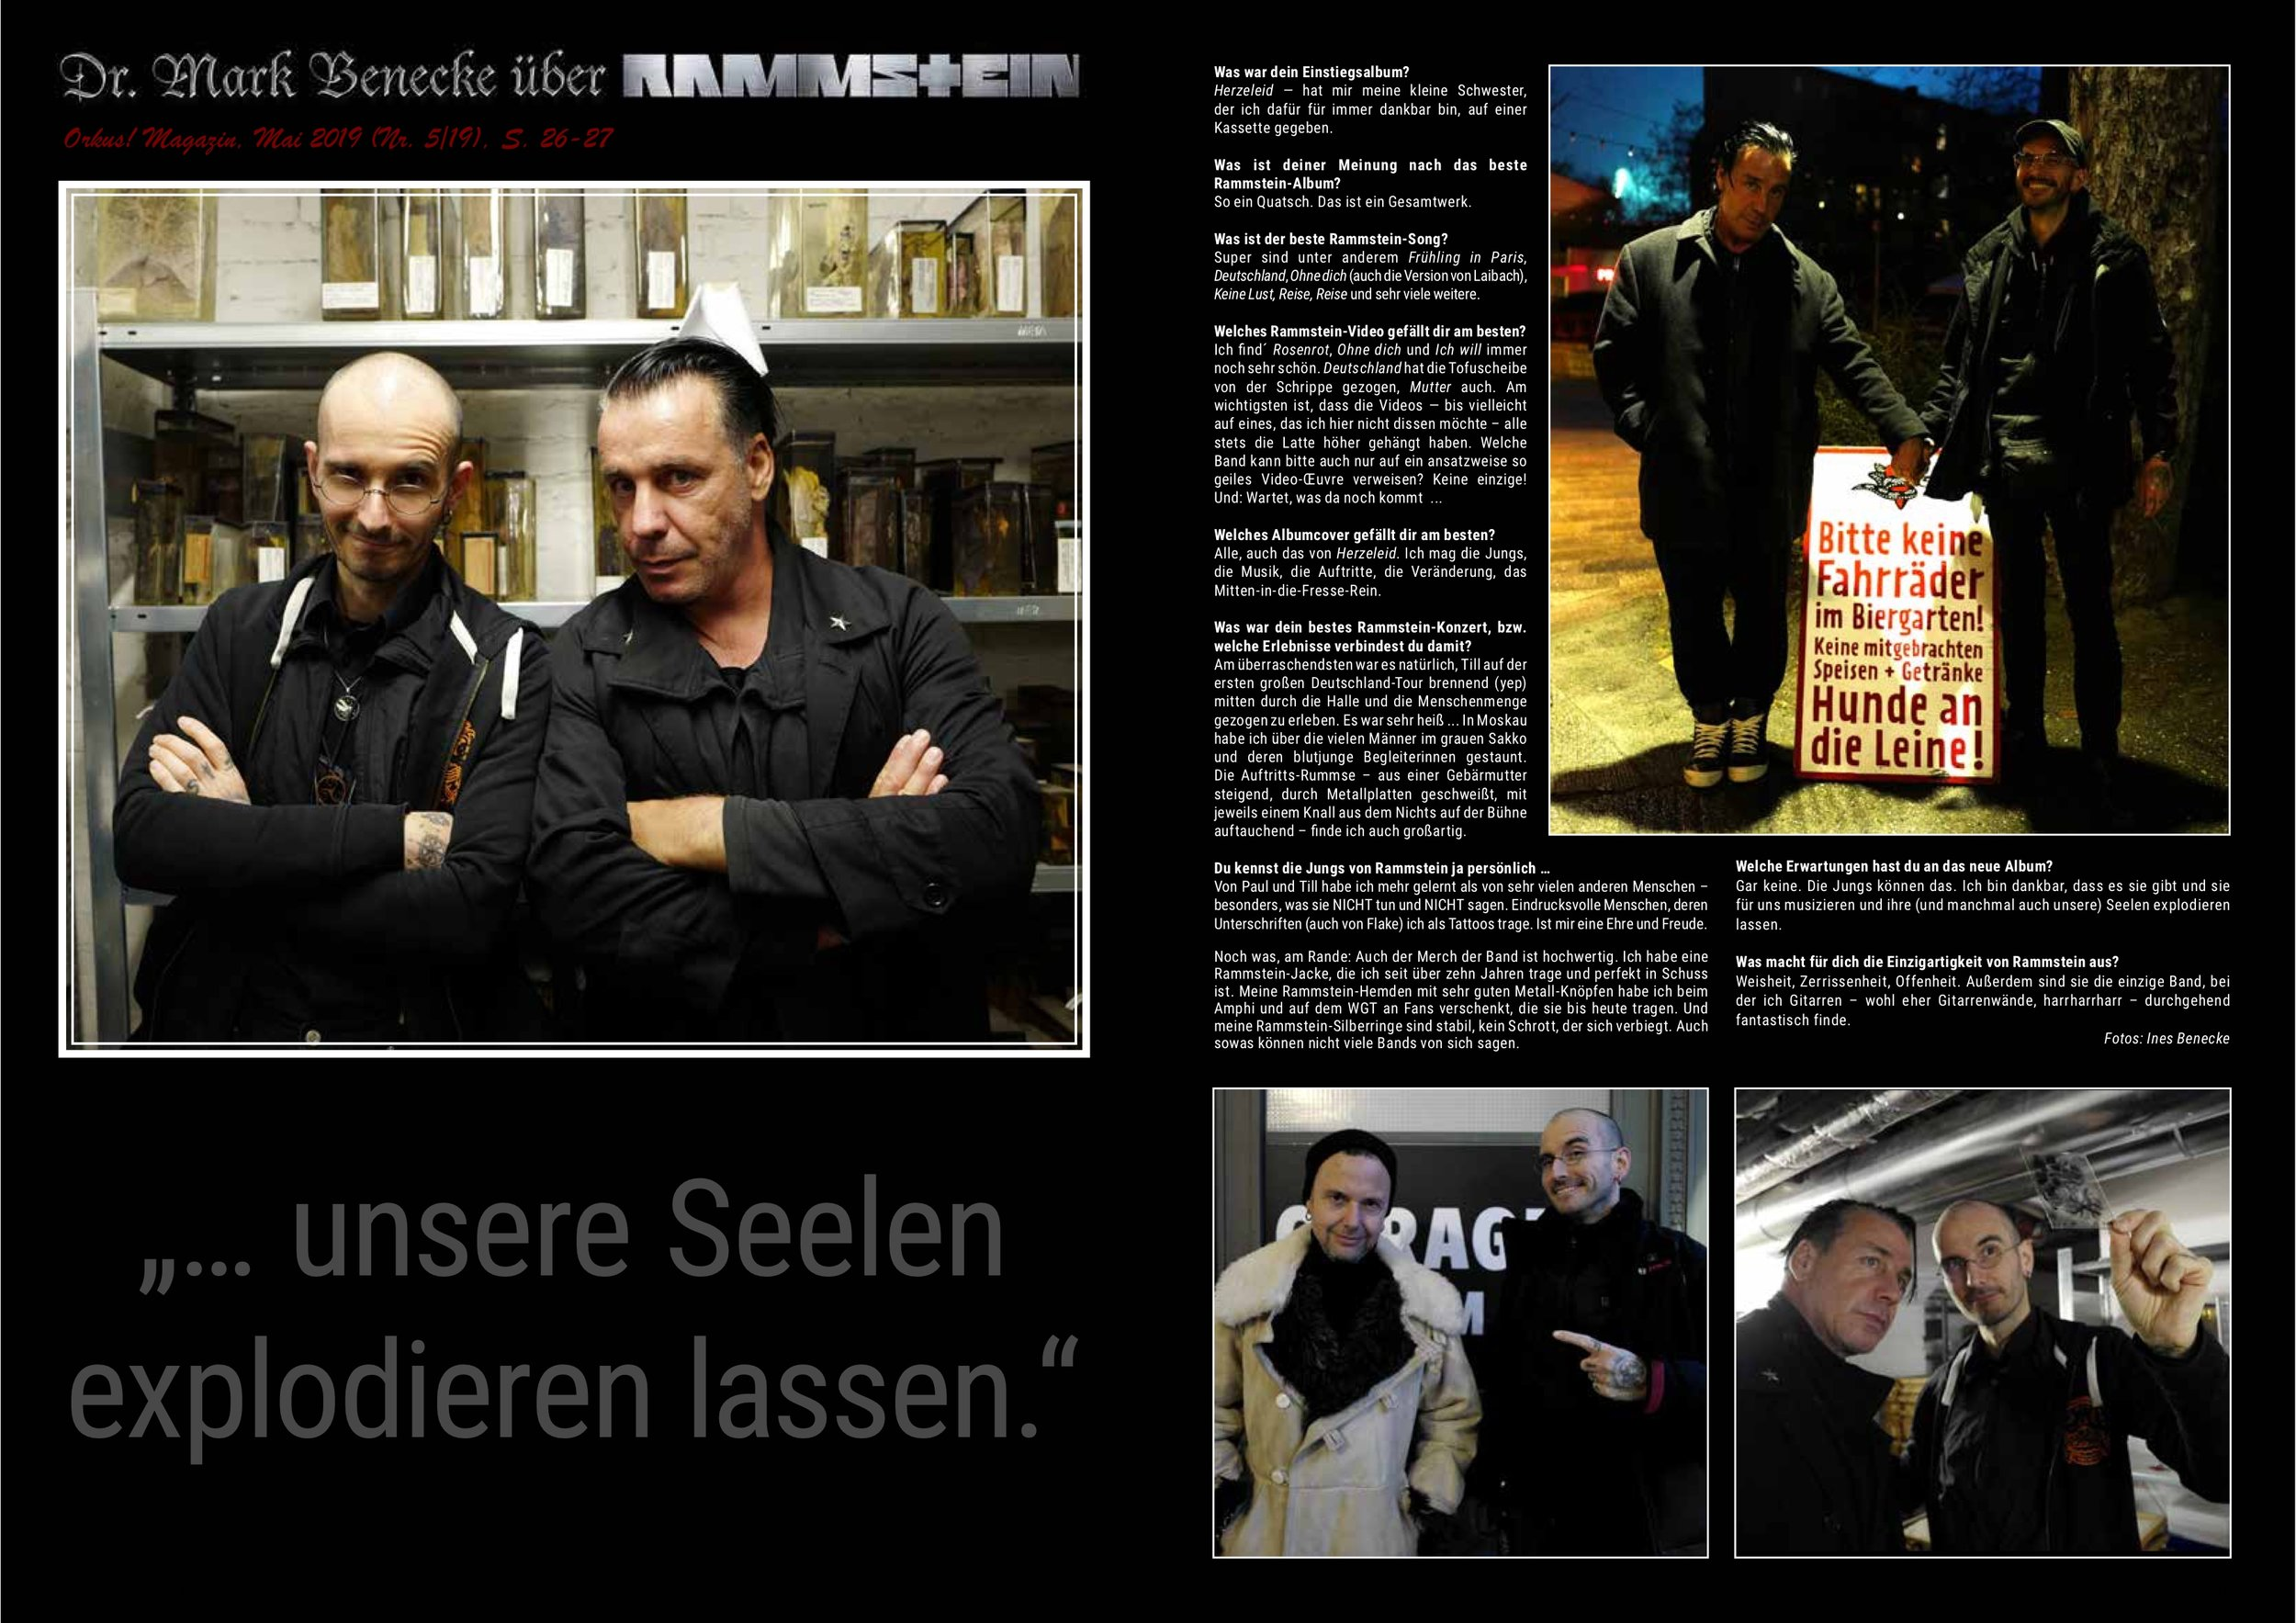 Rammstein_Dr_Mark_Benecke_Orkus_FINAL_jpg.jpg